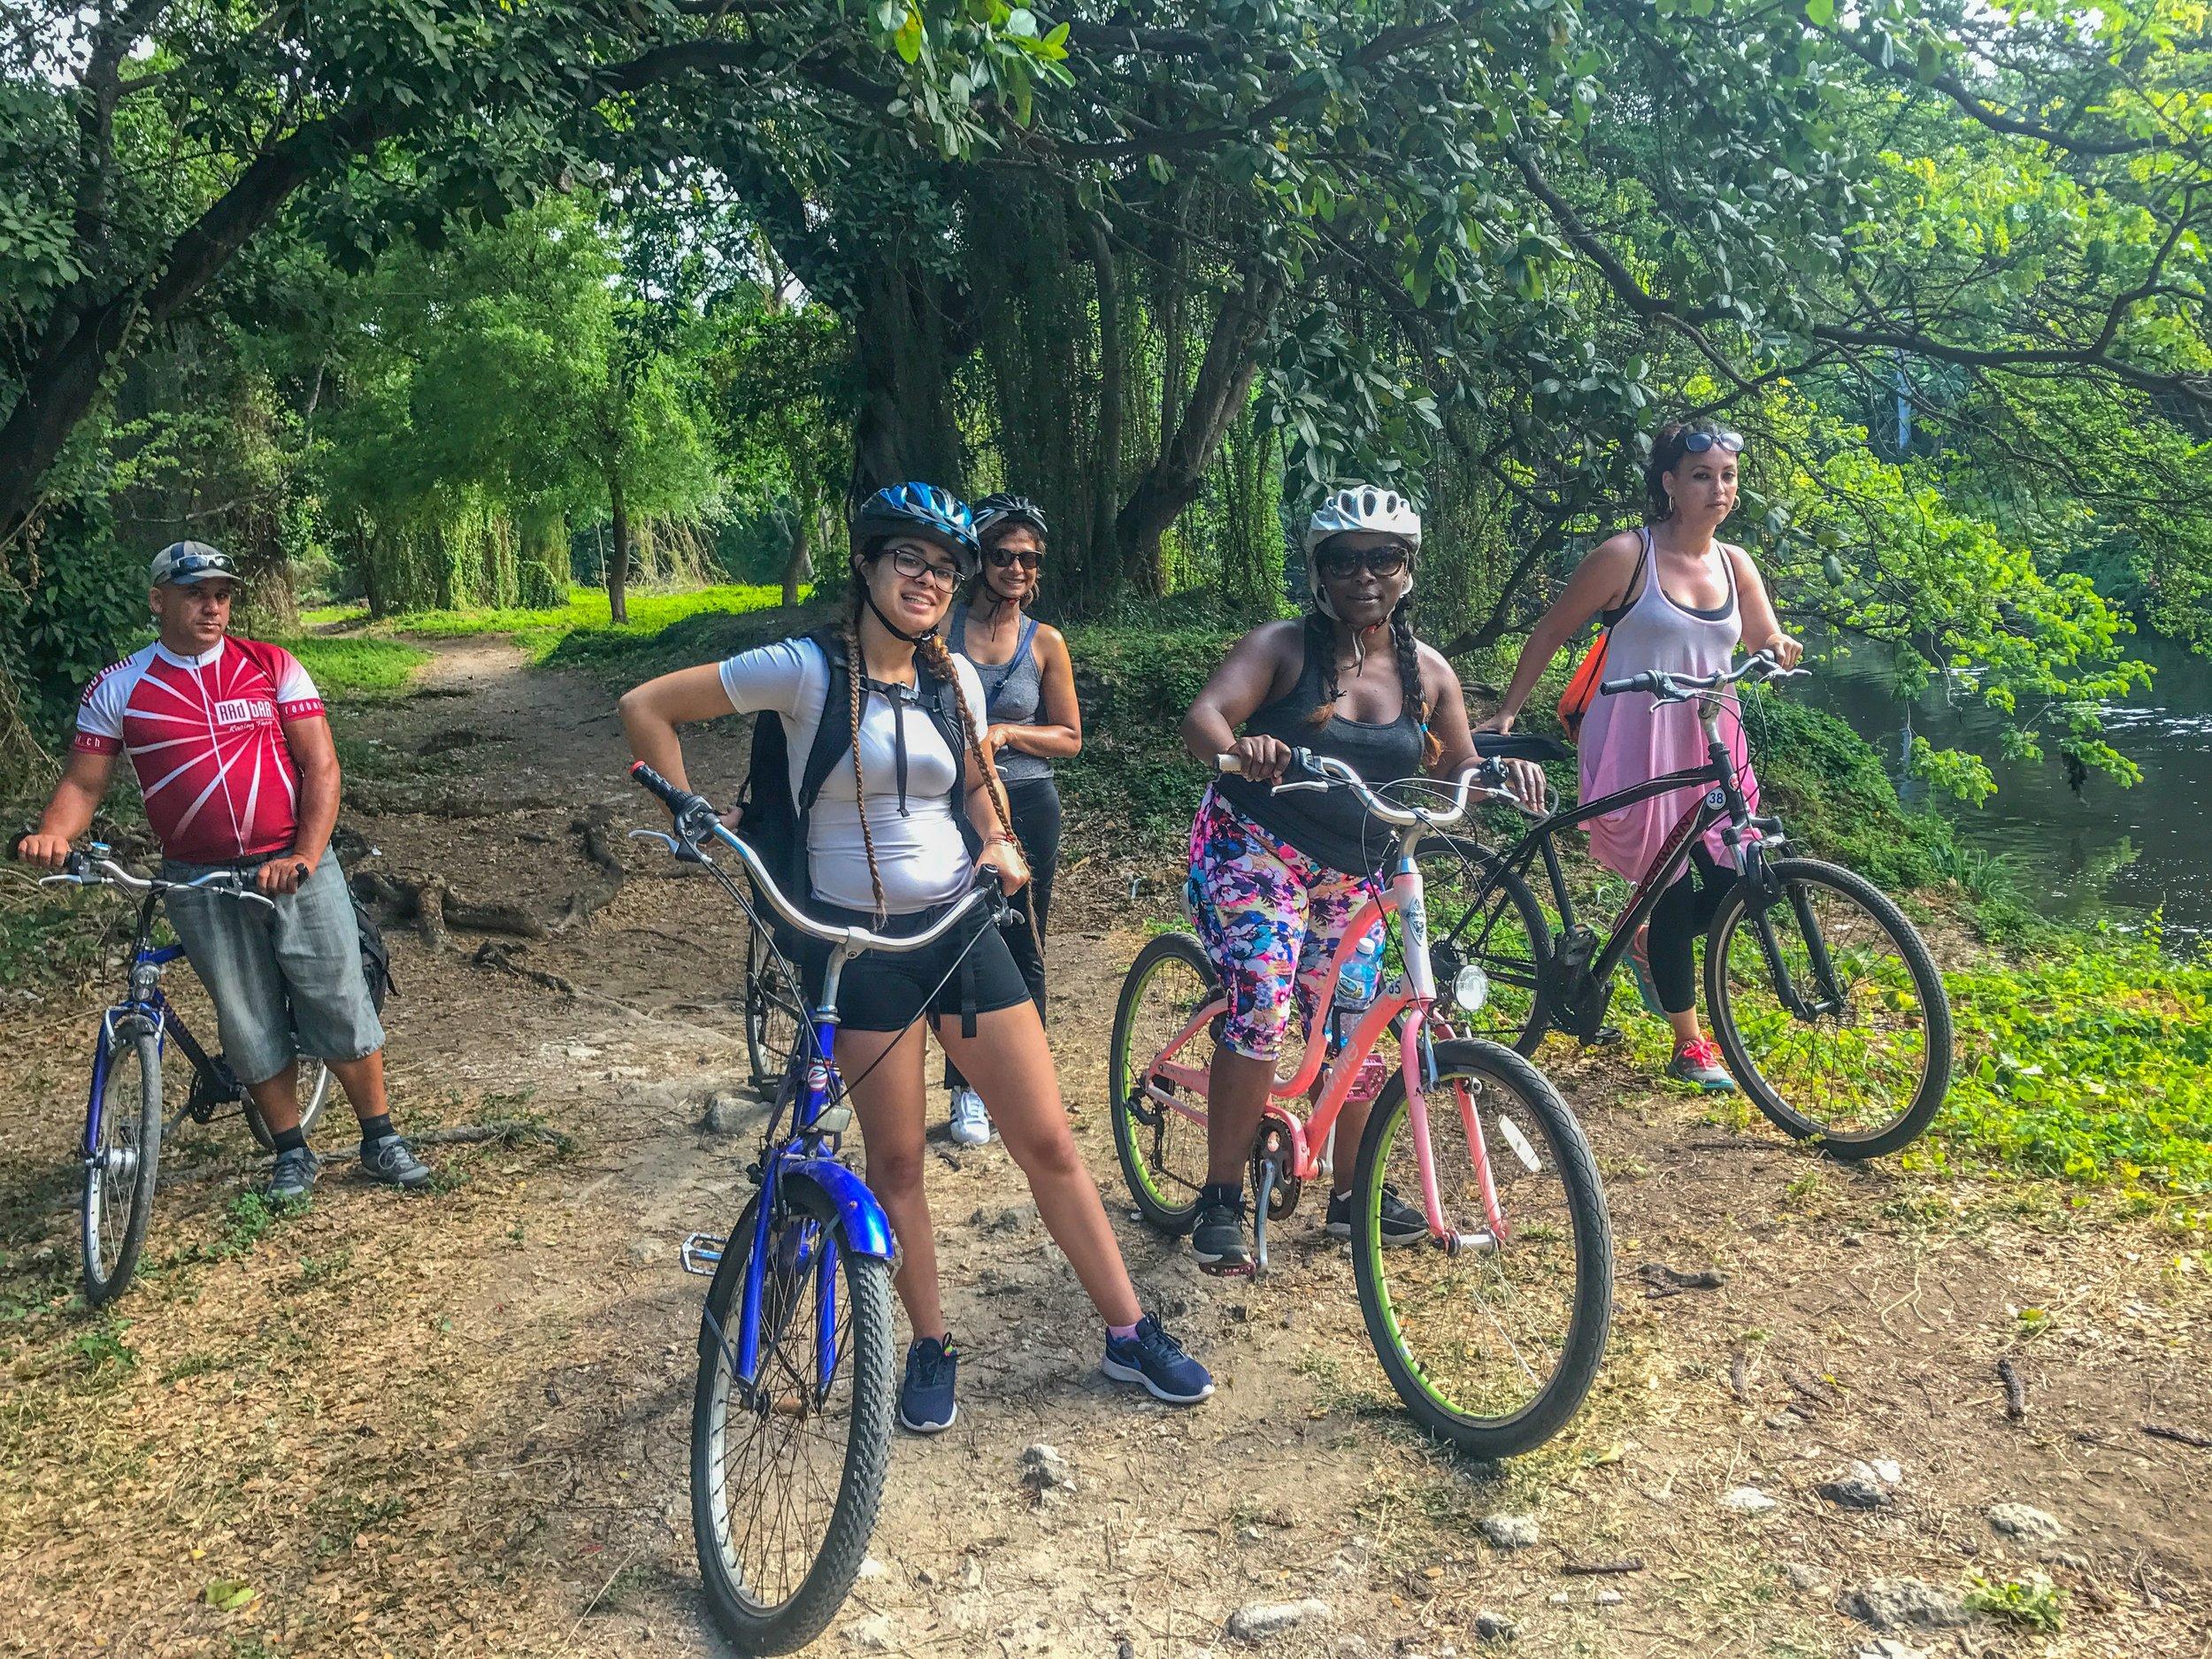 Bike tour through Havana's forest!